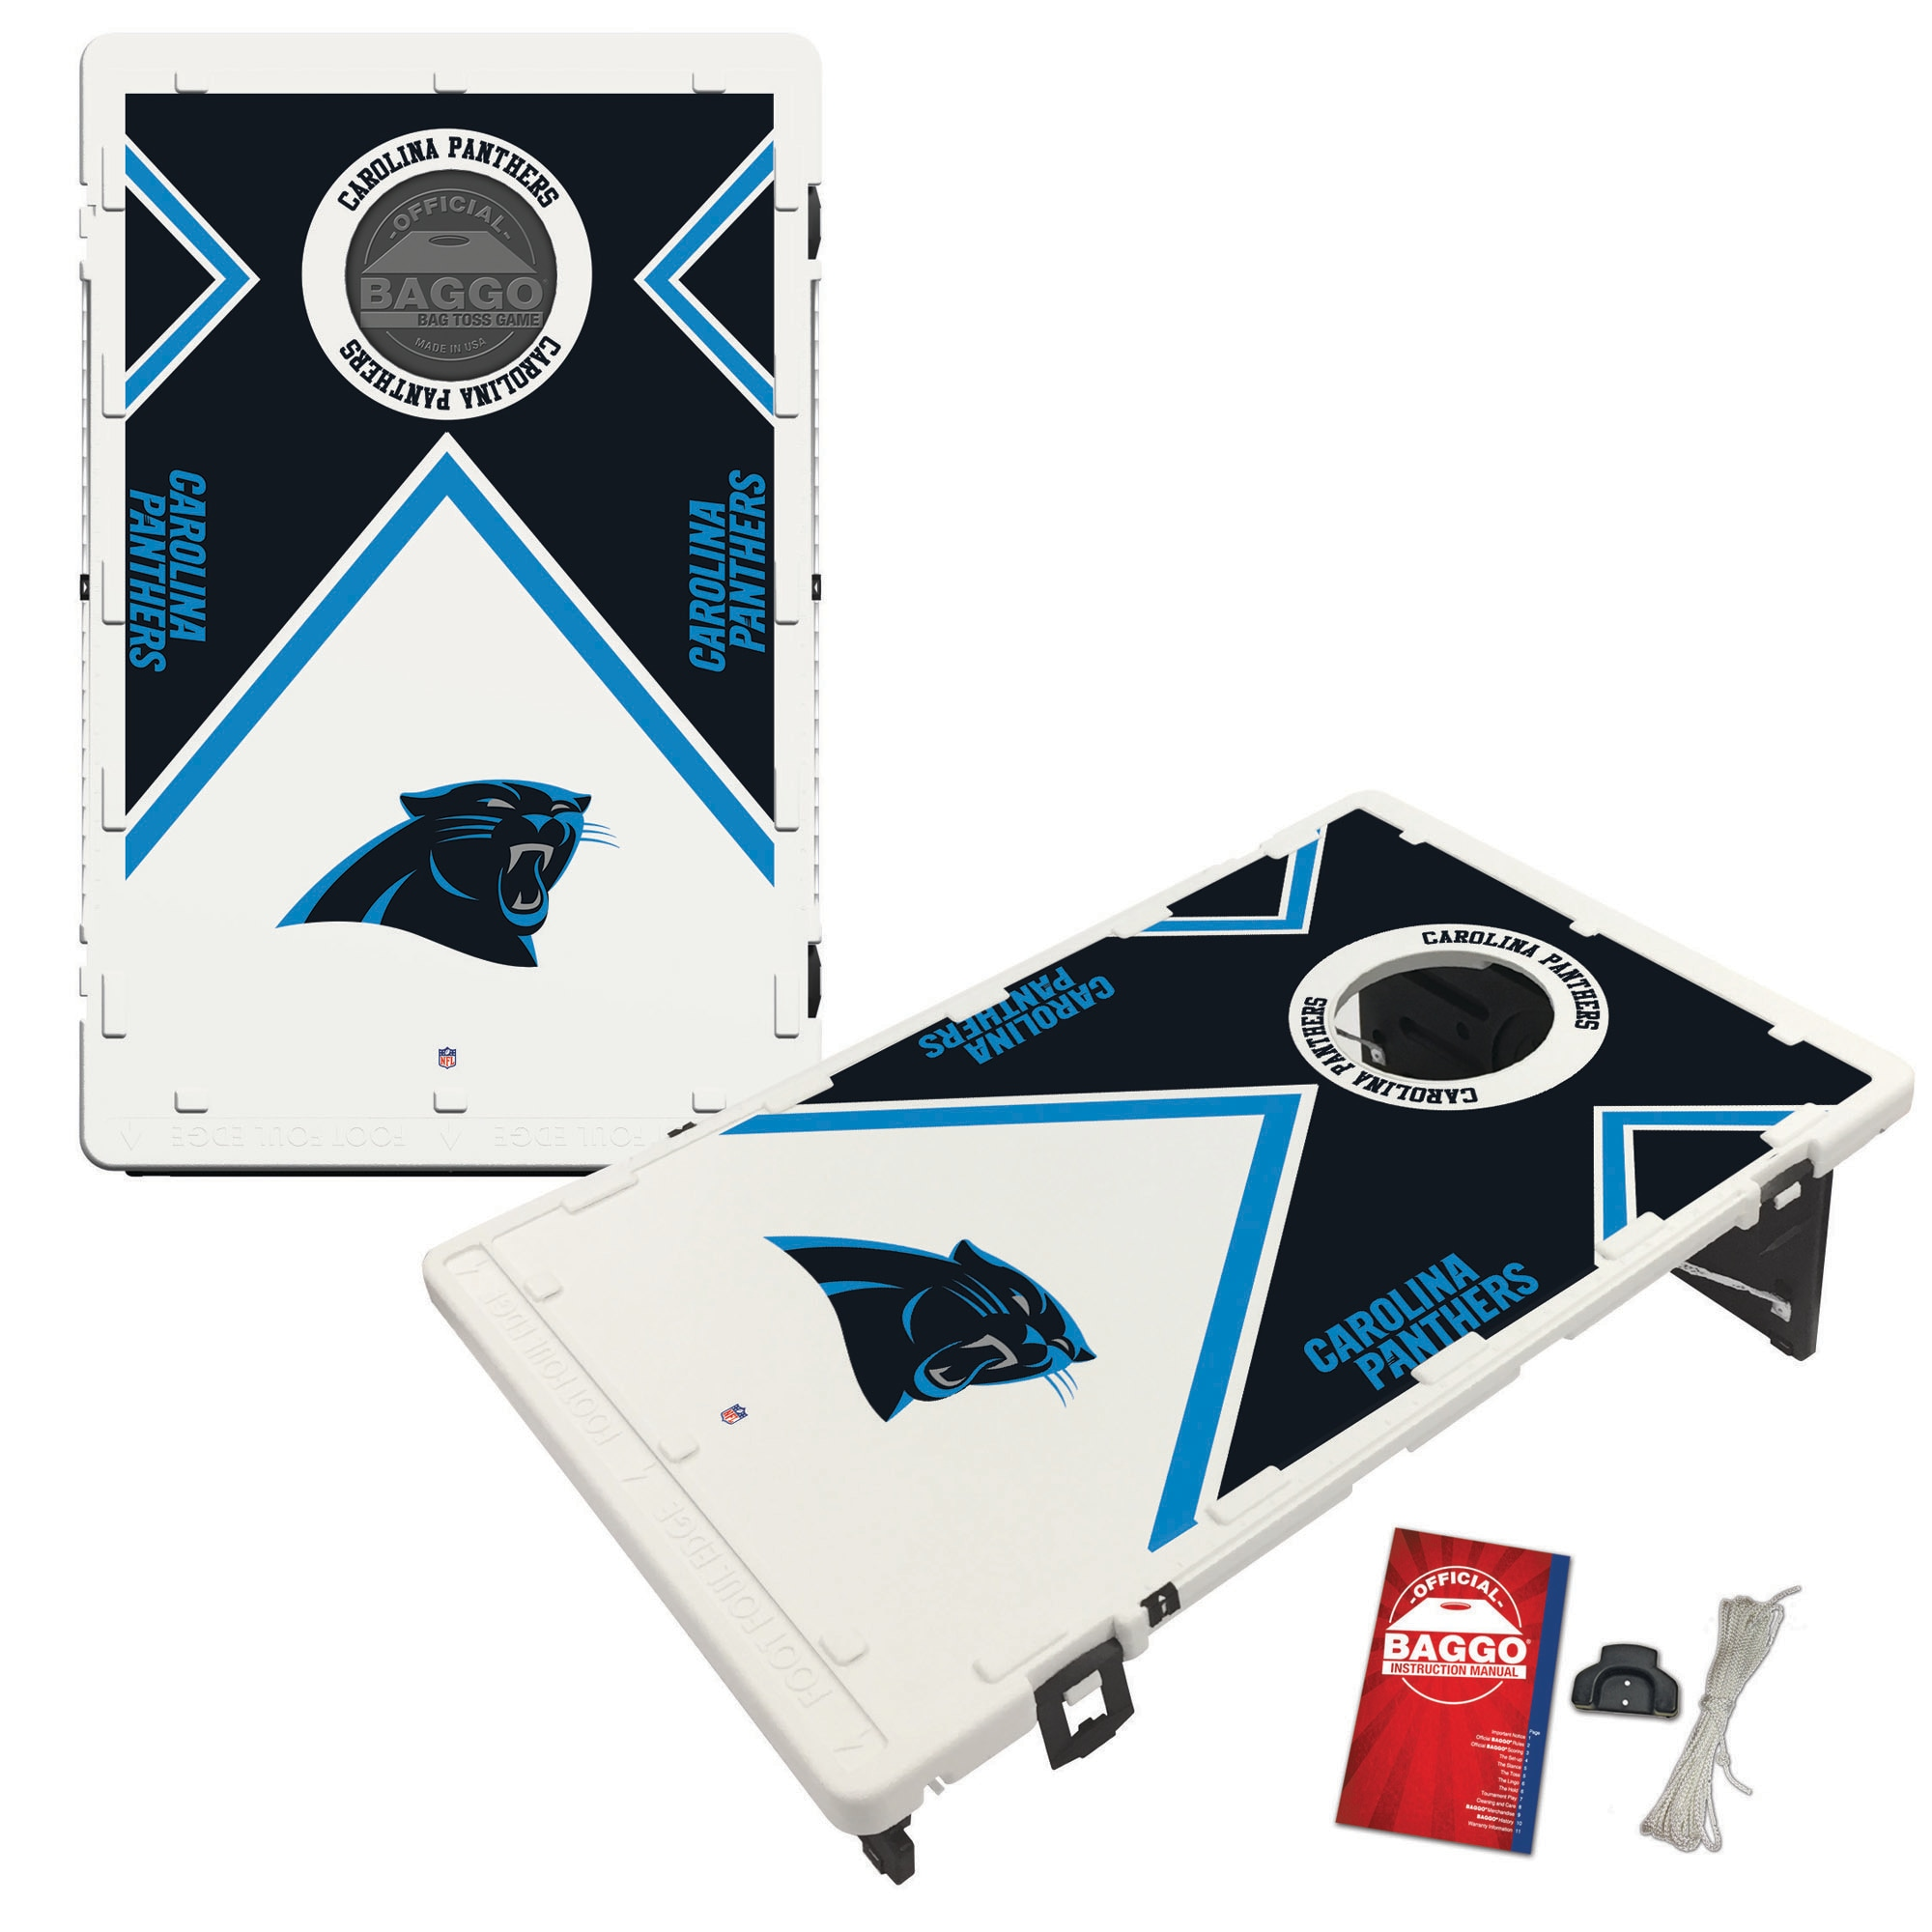 Carolina Panthers 2' x 3' BAGGO Vintage Cornhole Board Tailgate Toss Set